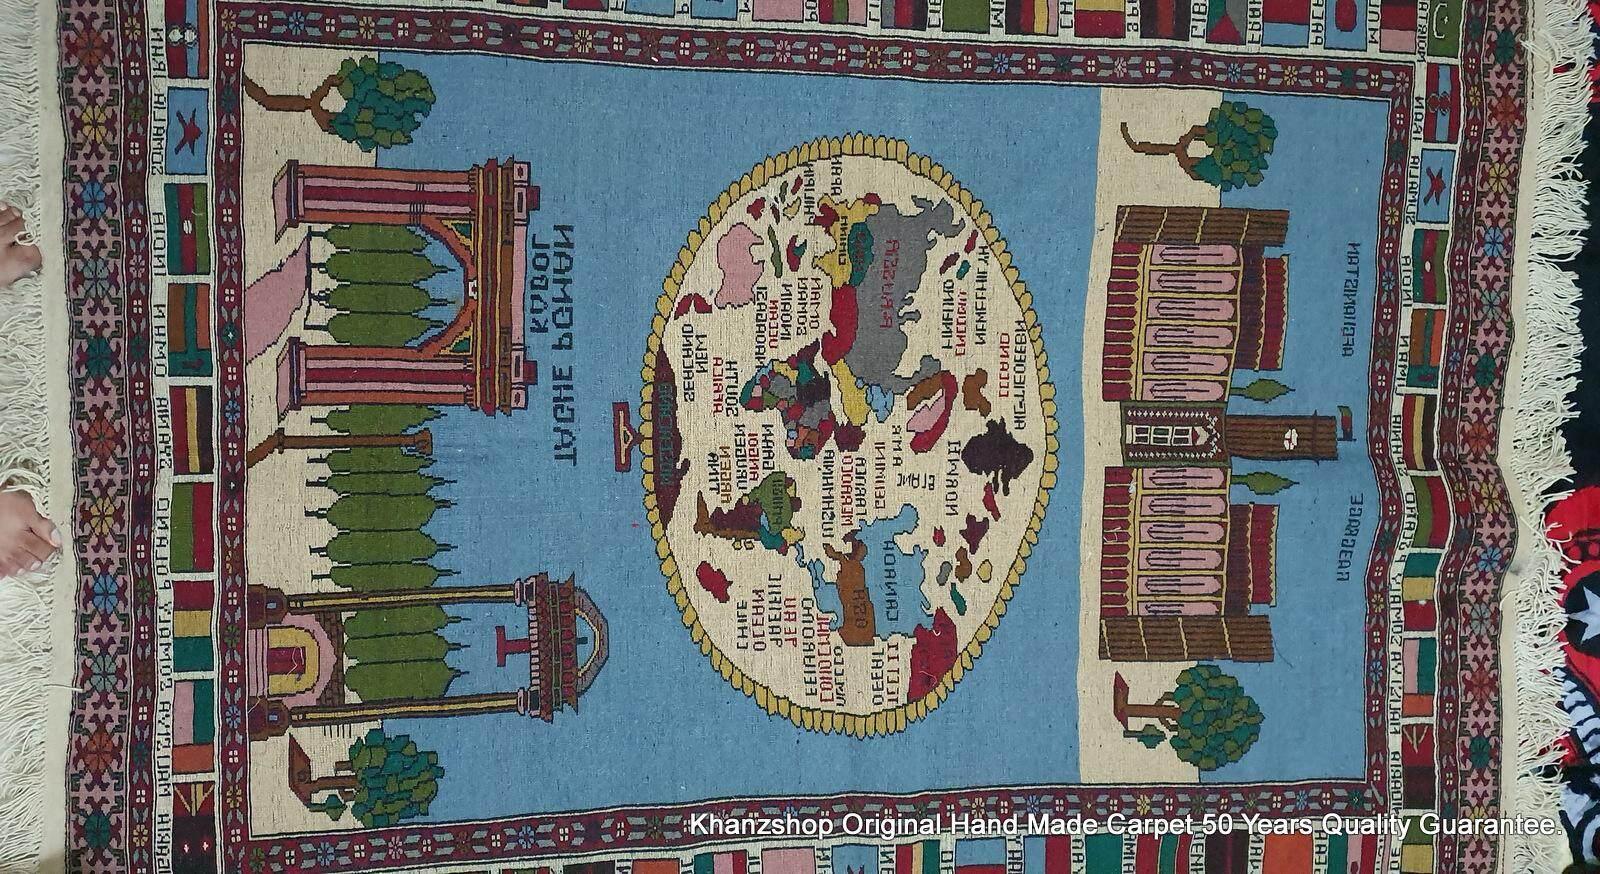 The Pakistan Original Hand Made Carpet (7.5ft x 5.5ft) With 50 Years Guarantee